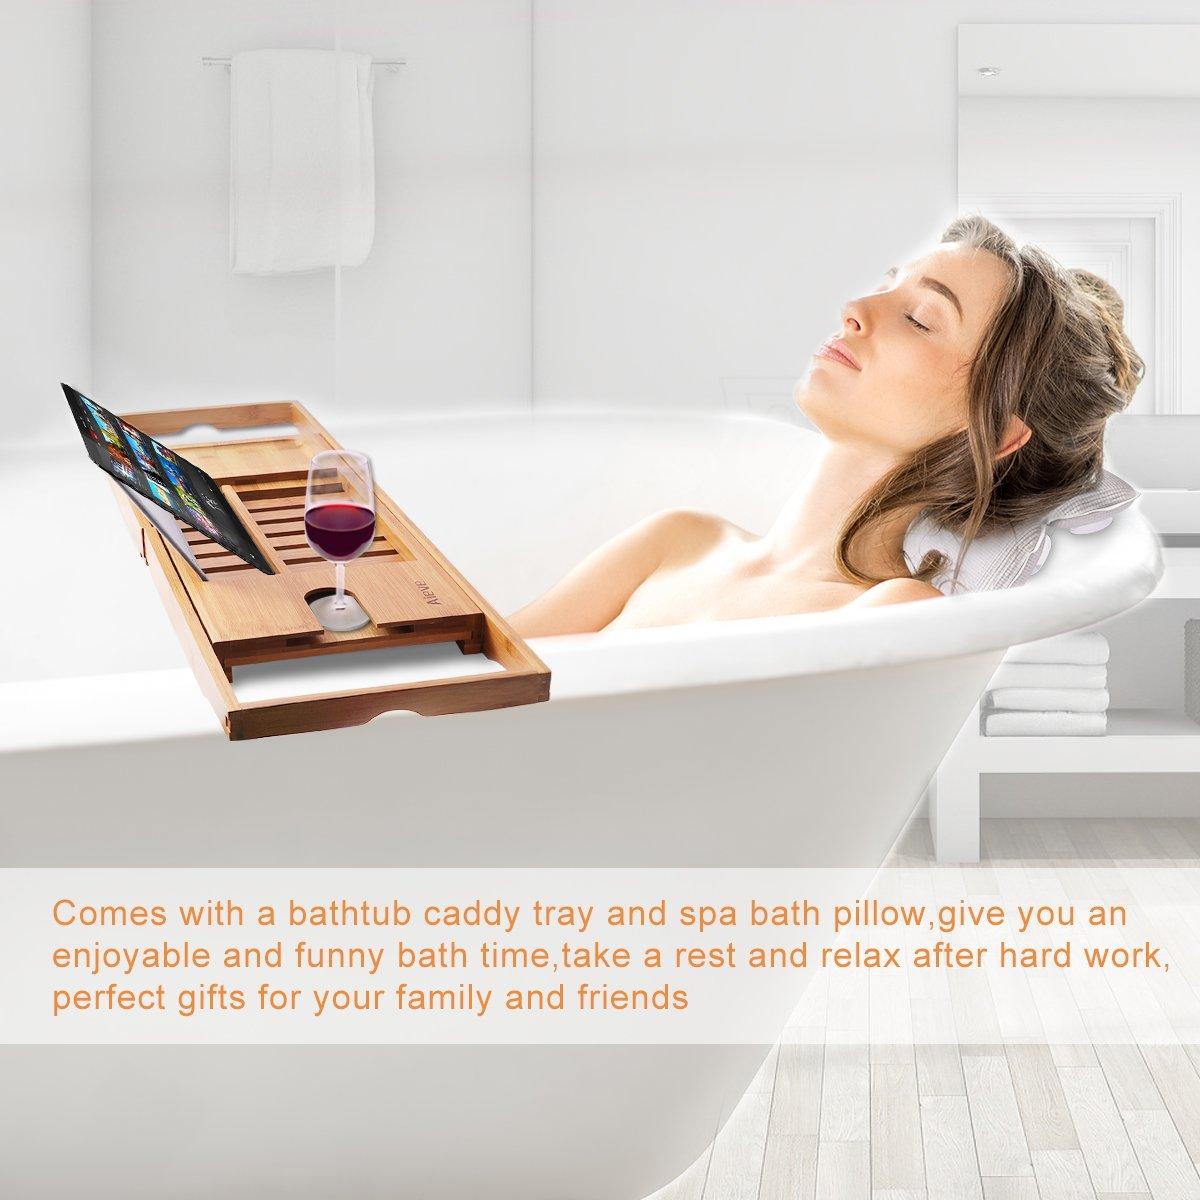 Amazon.com: AIEVE Bathtub Tray and Bath Pillow,Bamboo Bathtub Caddy ...